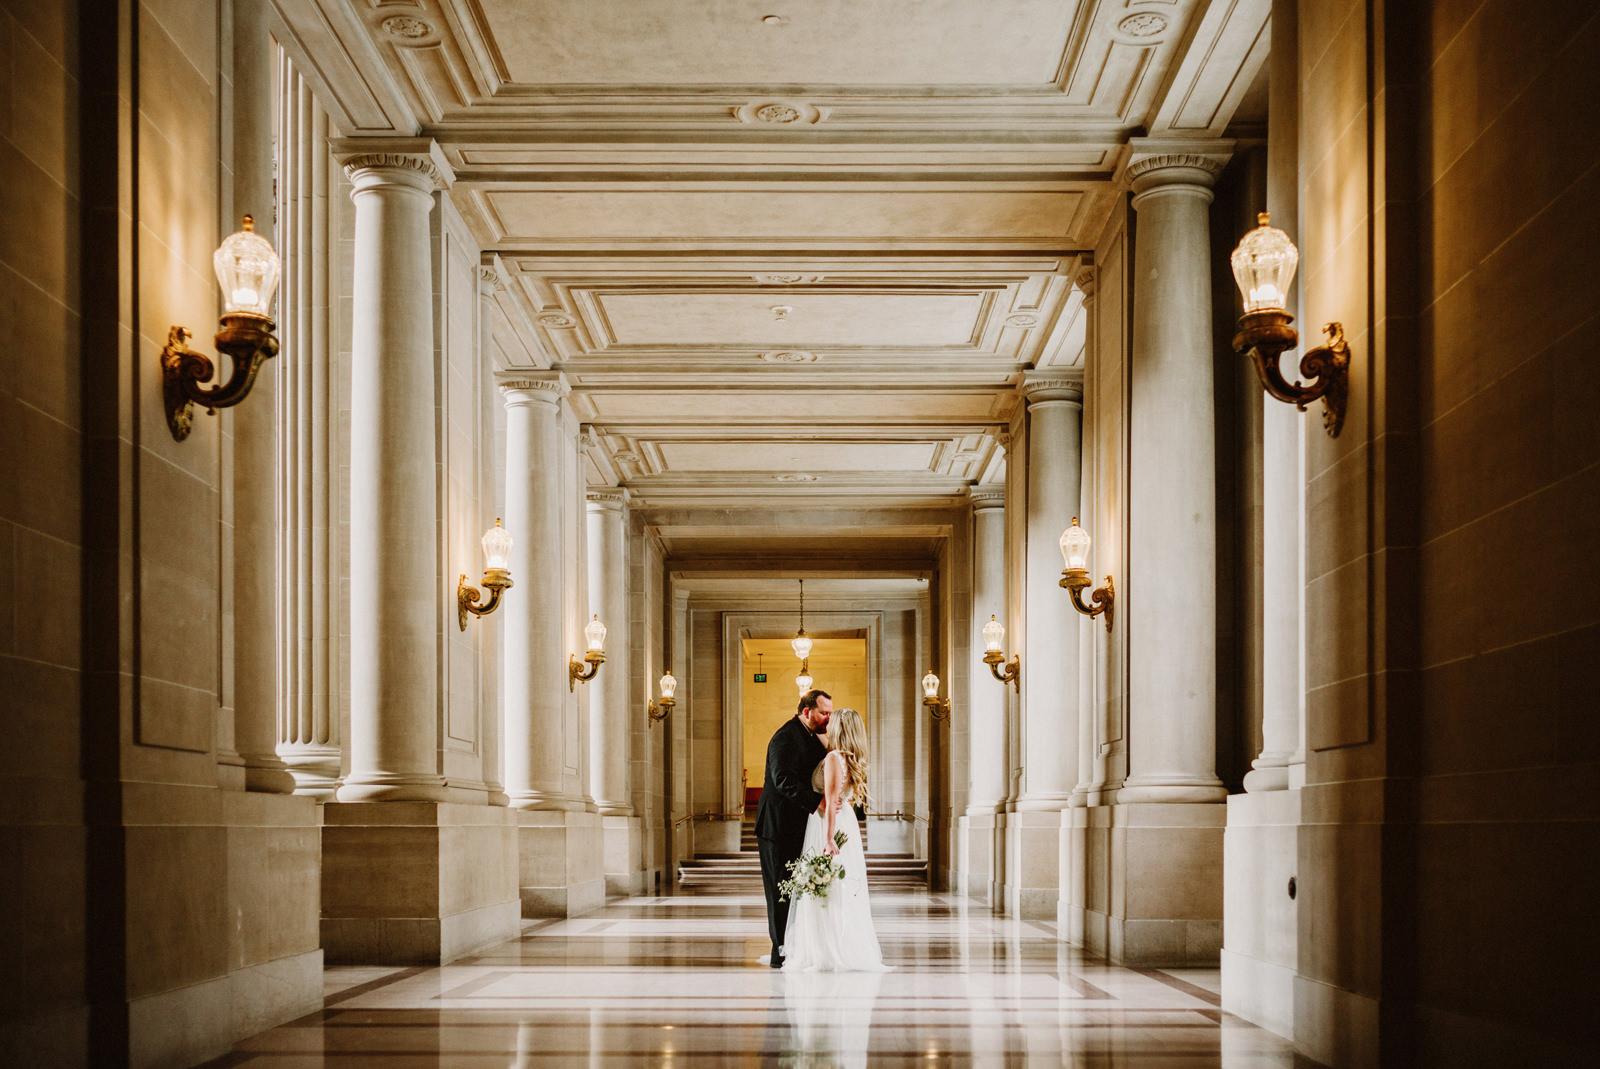 san-francisco-city-hall-elopement-06 SAN FRANCISCO CITY HALL INTIMATE WEDDING